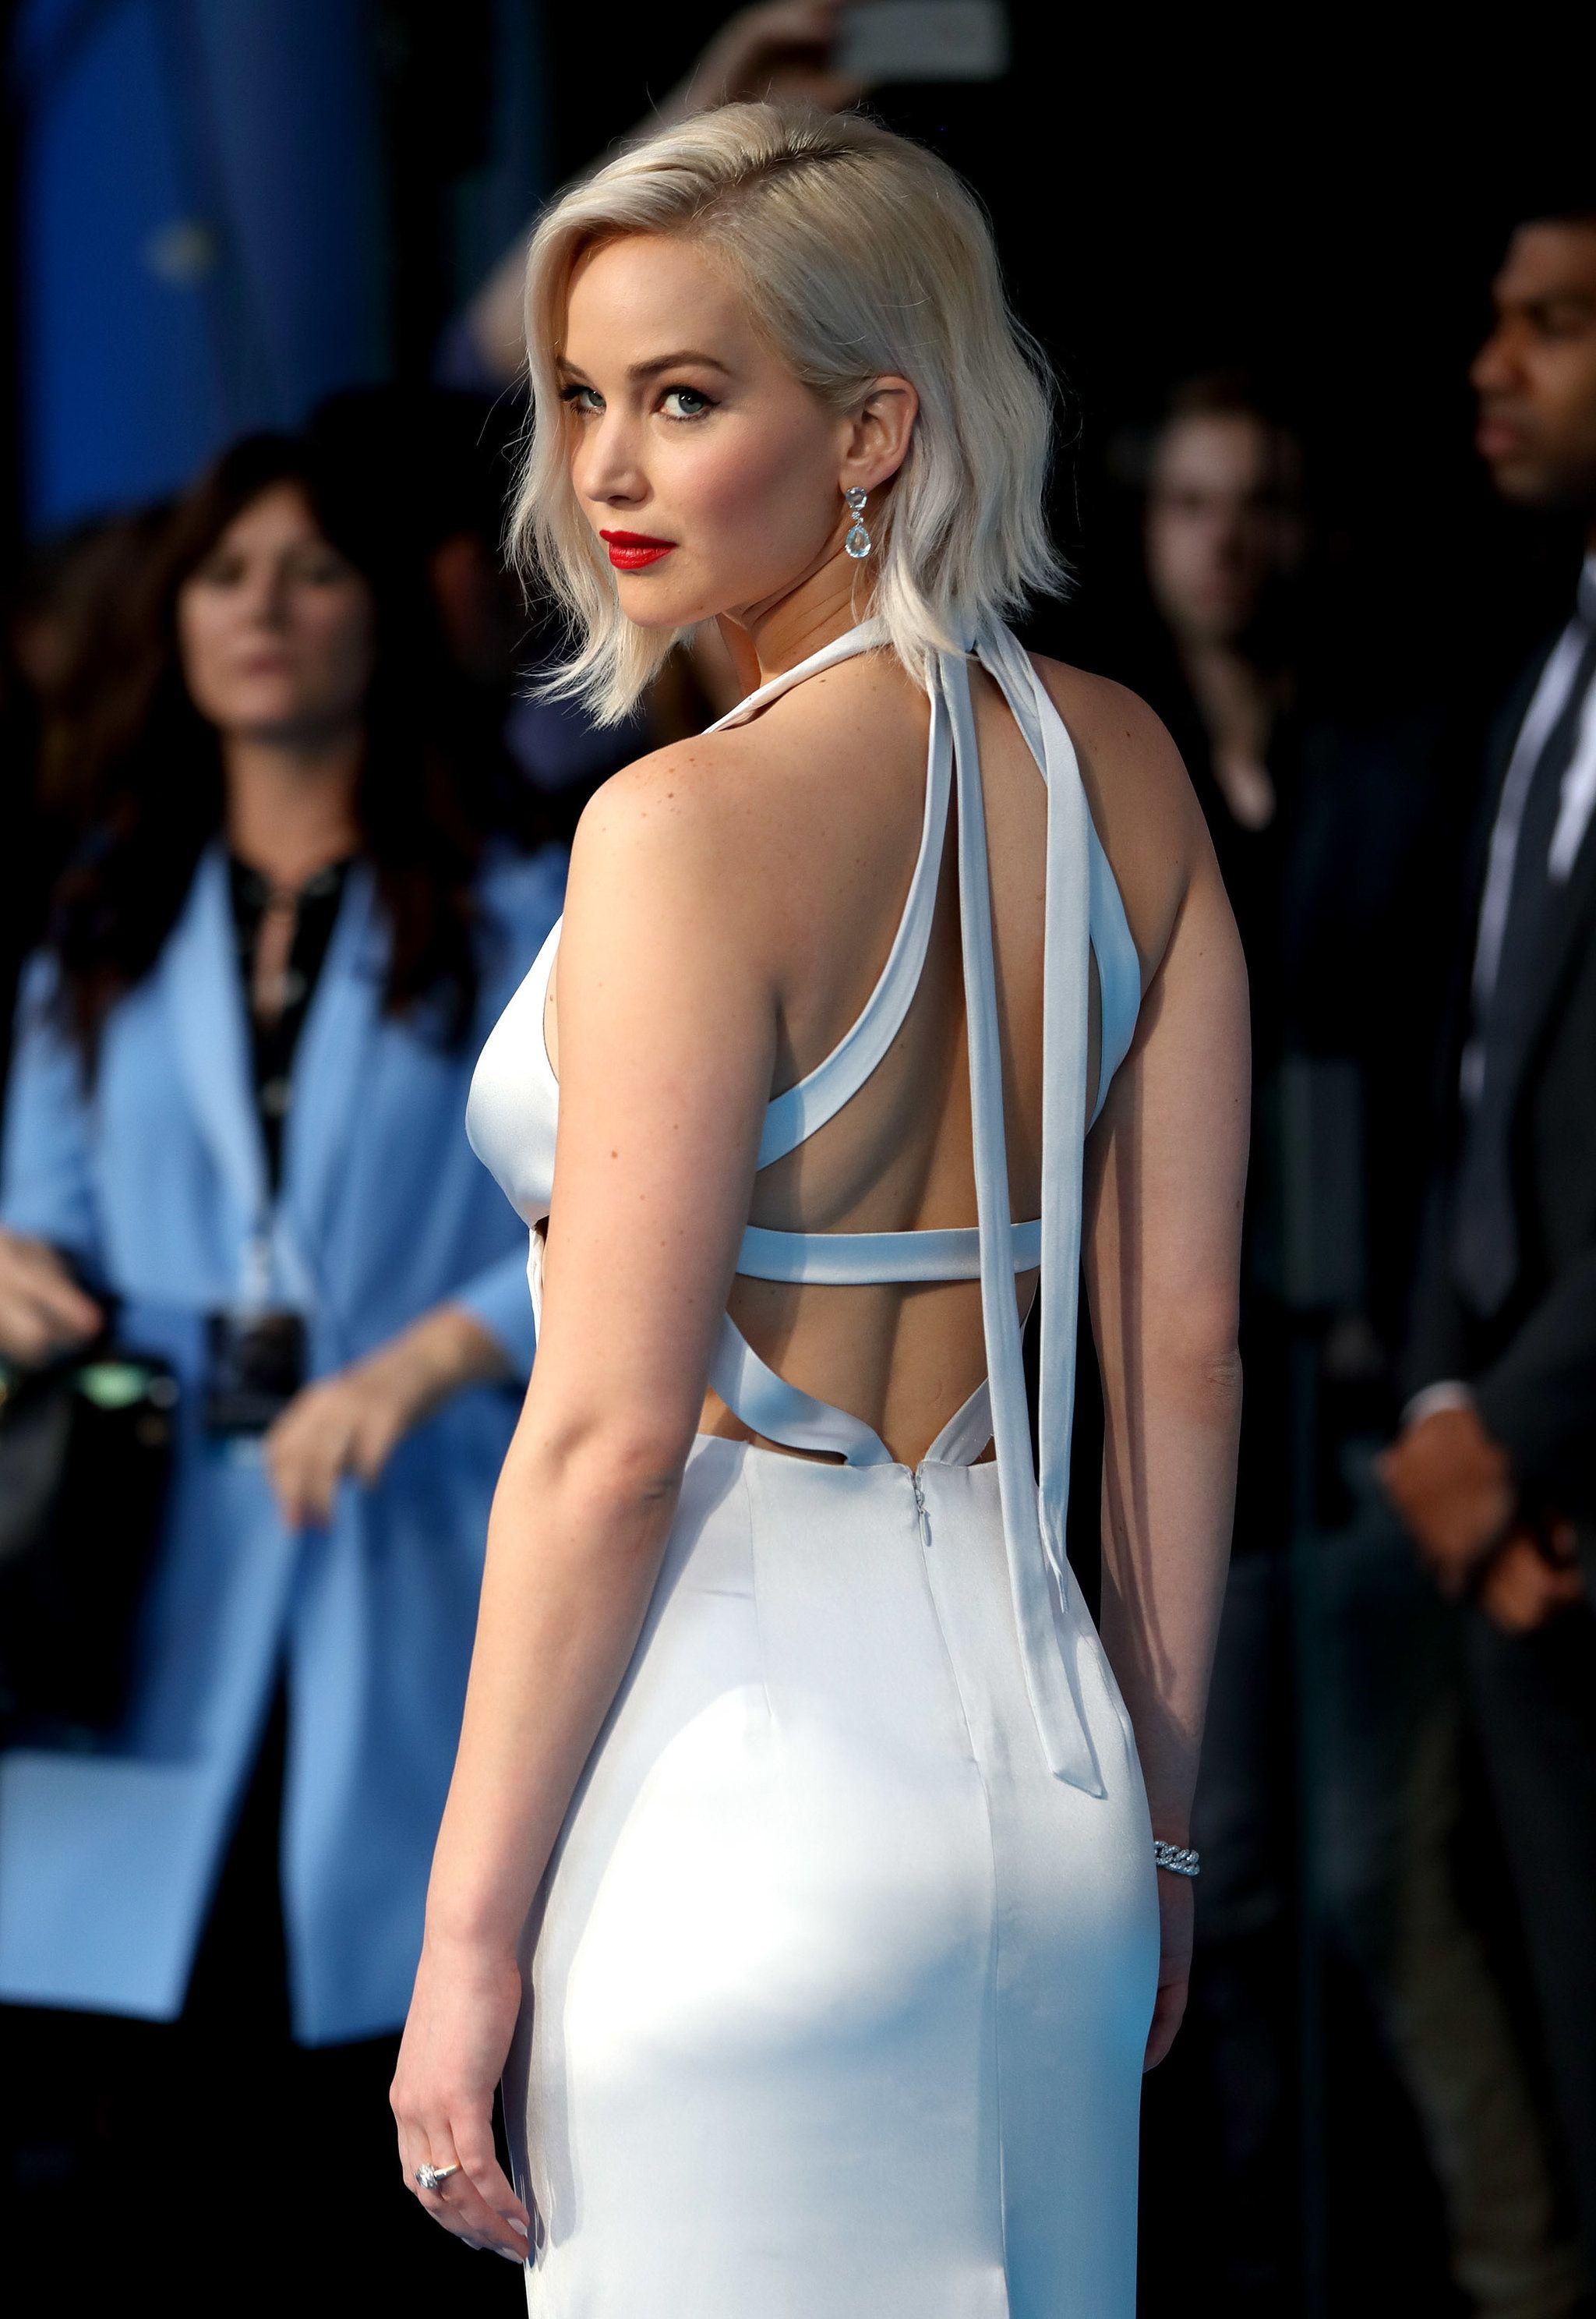 Jennifer Lawrence S White Hot Appearance On The X Men Apocalypse